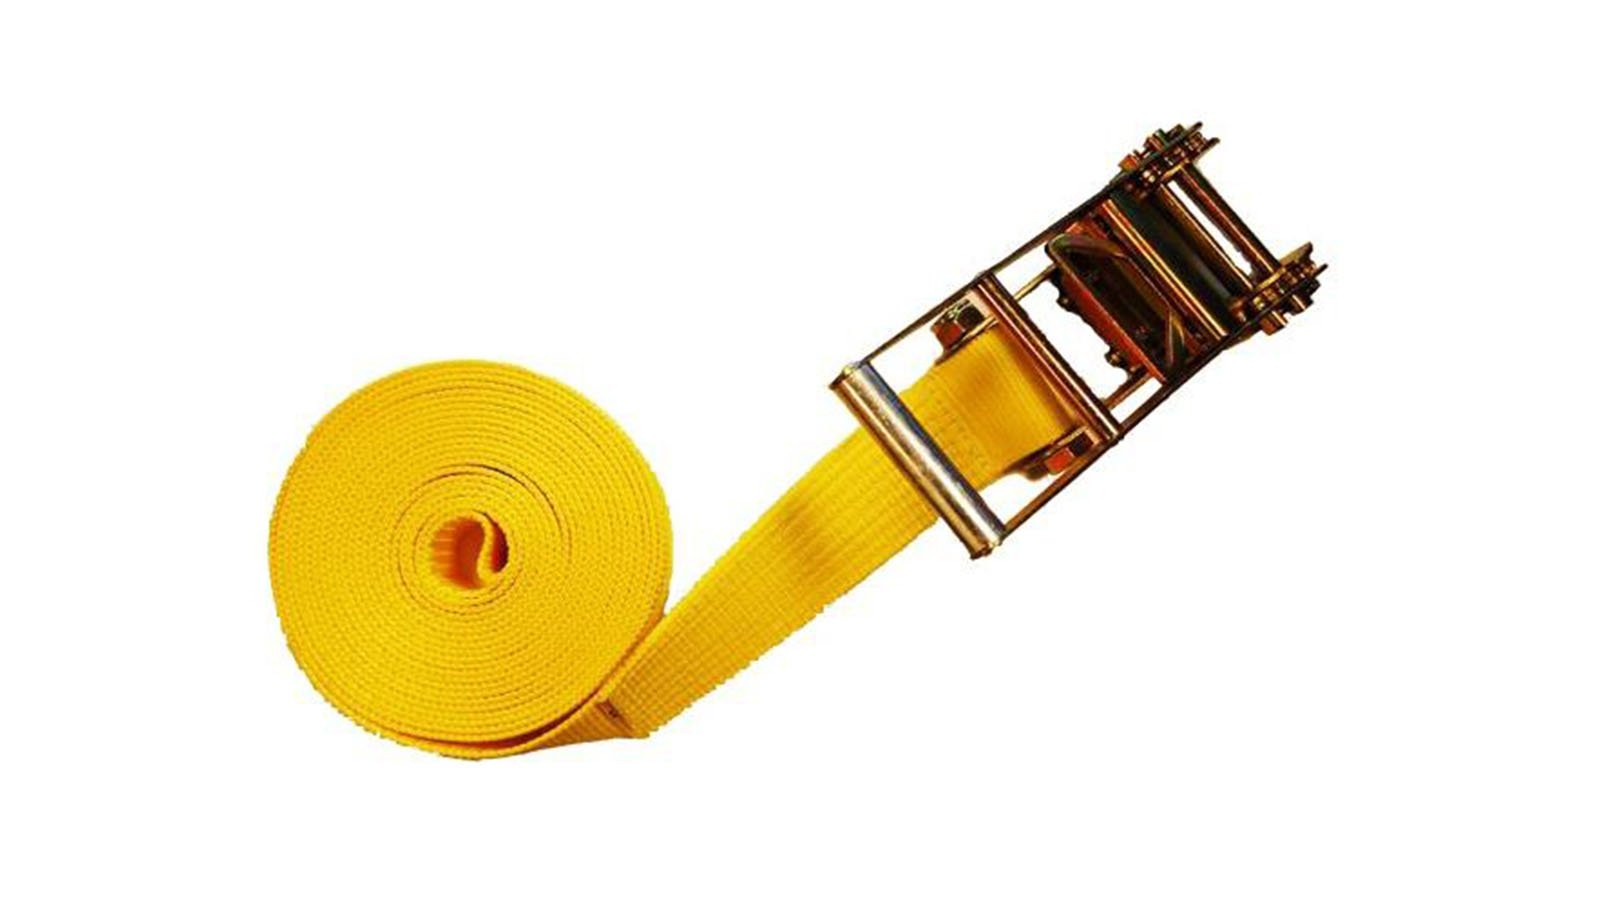 Spanband 75 mm LC 5000 - 10000 daN 1 delig